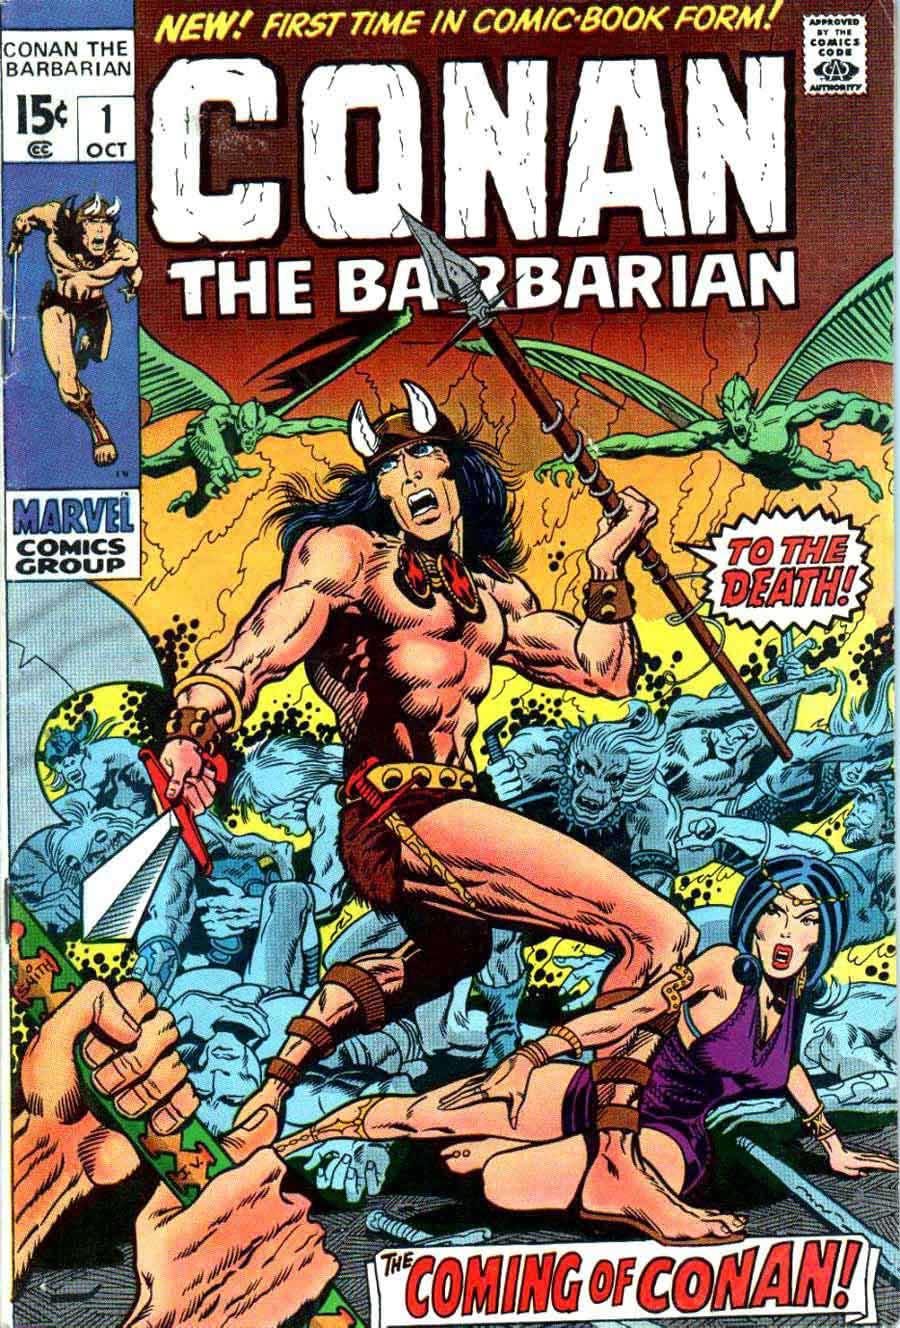 Conan The Barbarian (Barry Windsor-Smith)